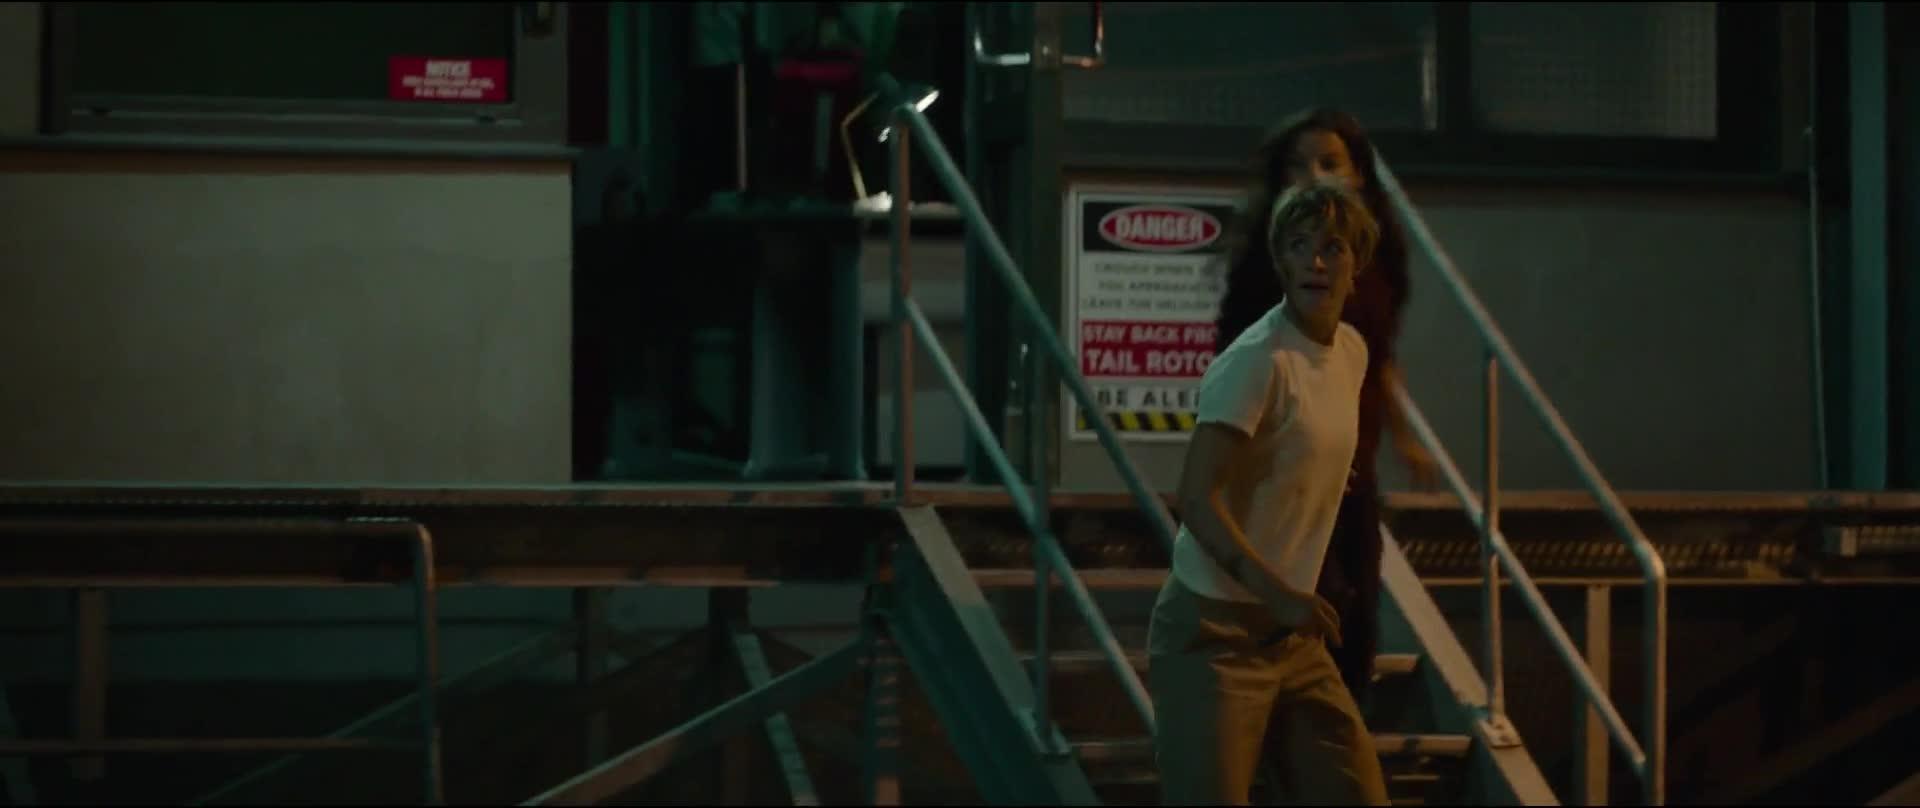 Terminator Temny osud 2019 CZ dabing HD 1080p